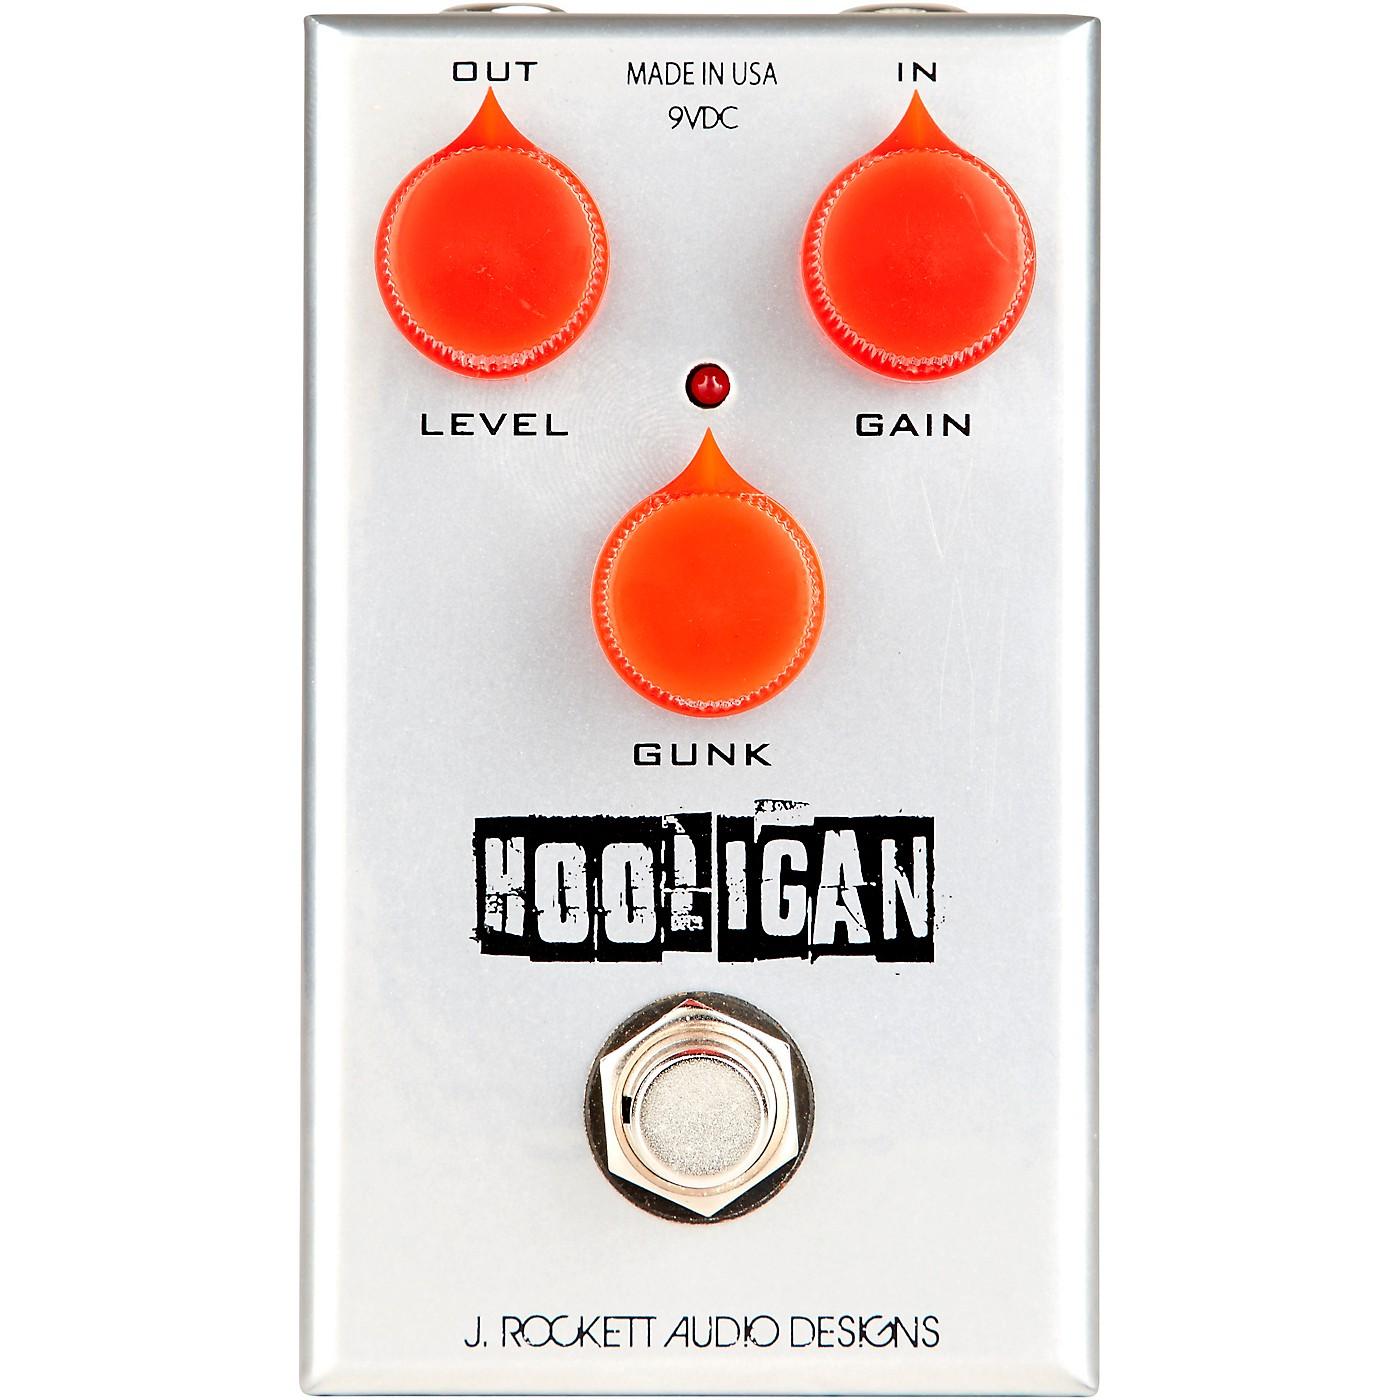 Rockett Pedals The Hooligan Tour Series Fuzz Effects Pedal thumbnail